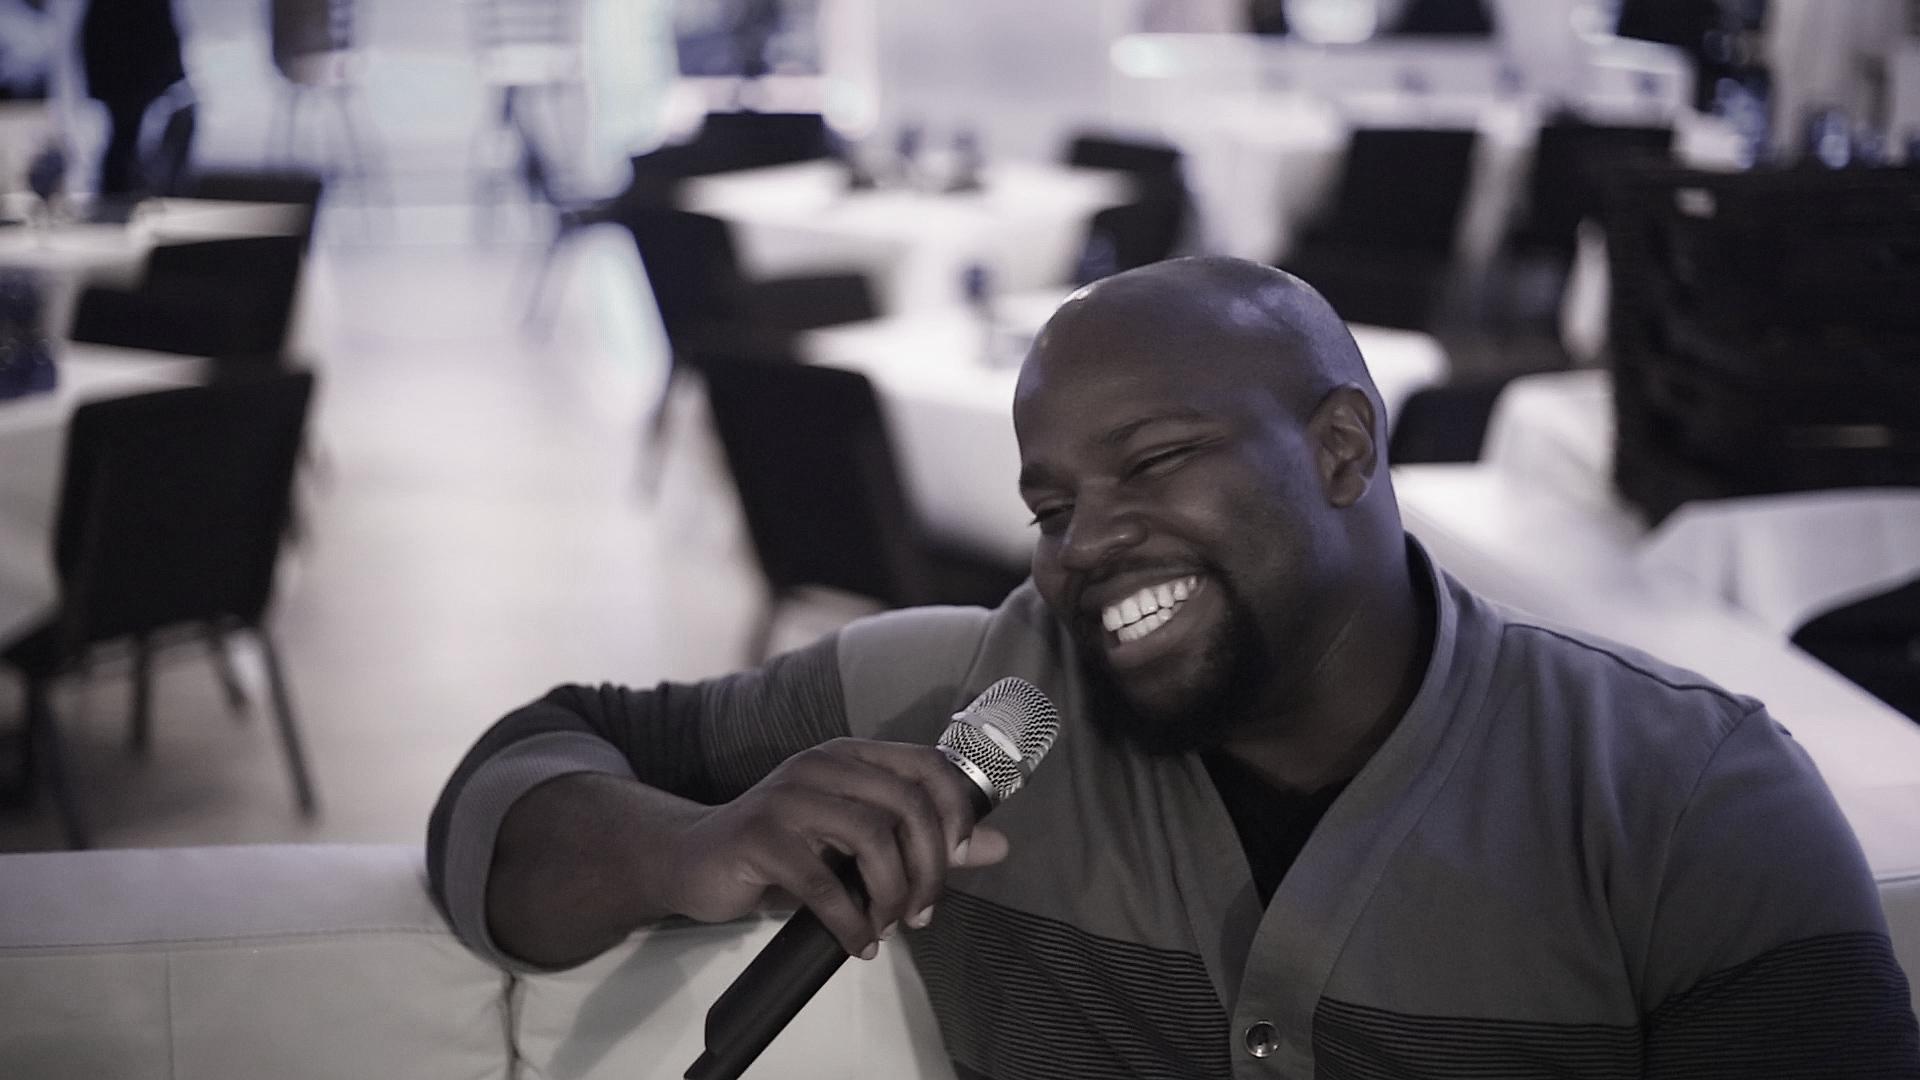 man smiling with mic.jpg